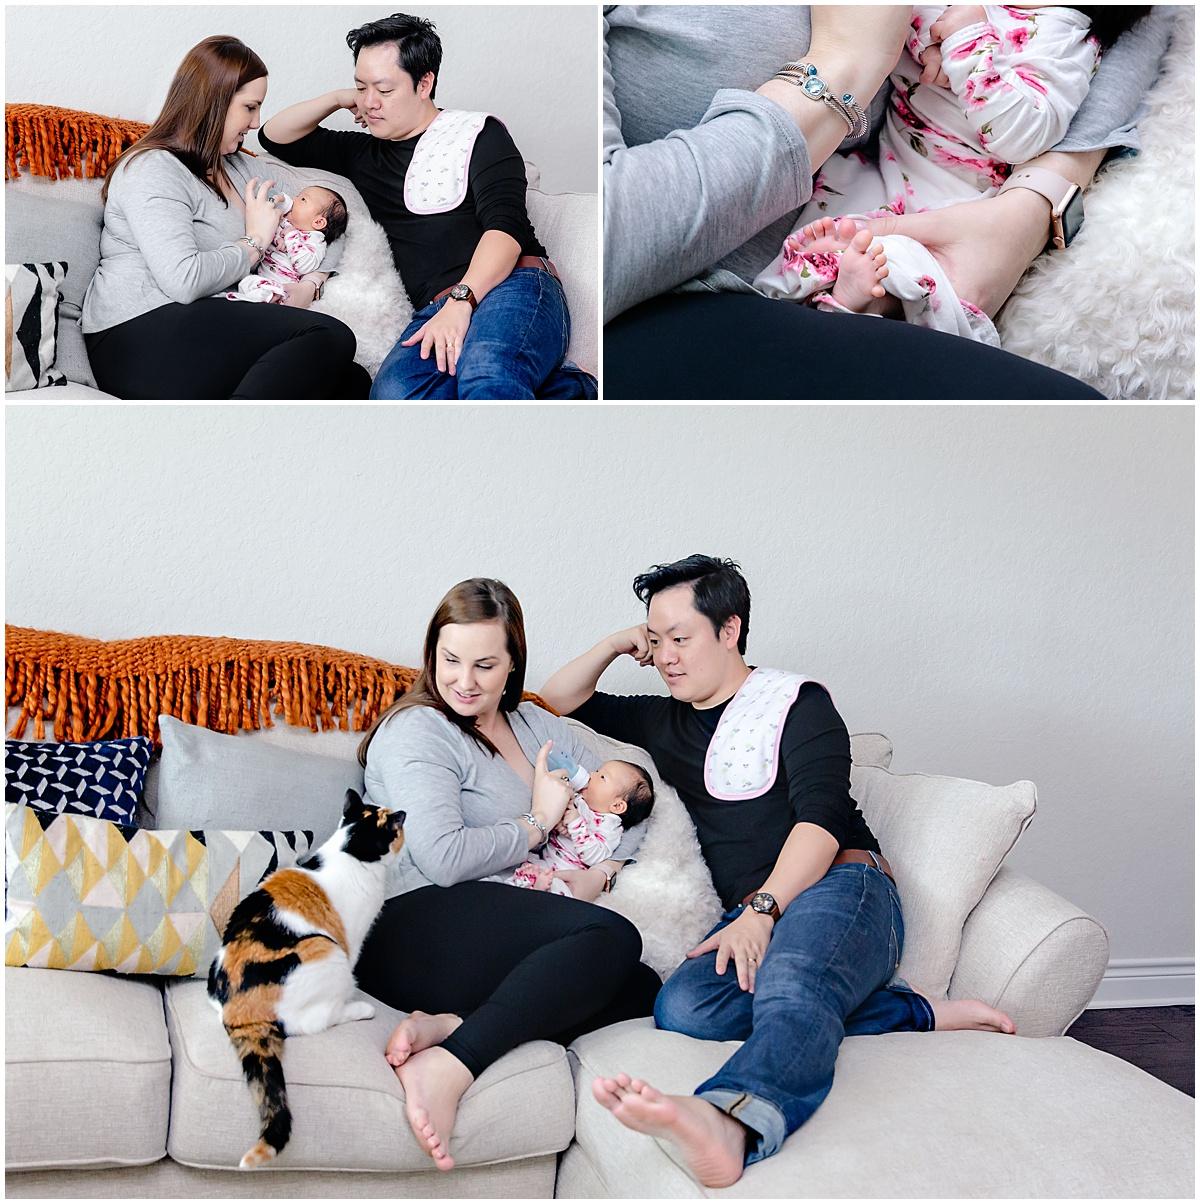 Lifestyle-newborn-family-photos-san-antonio-texas-carly-barton-photography_0008.jpg